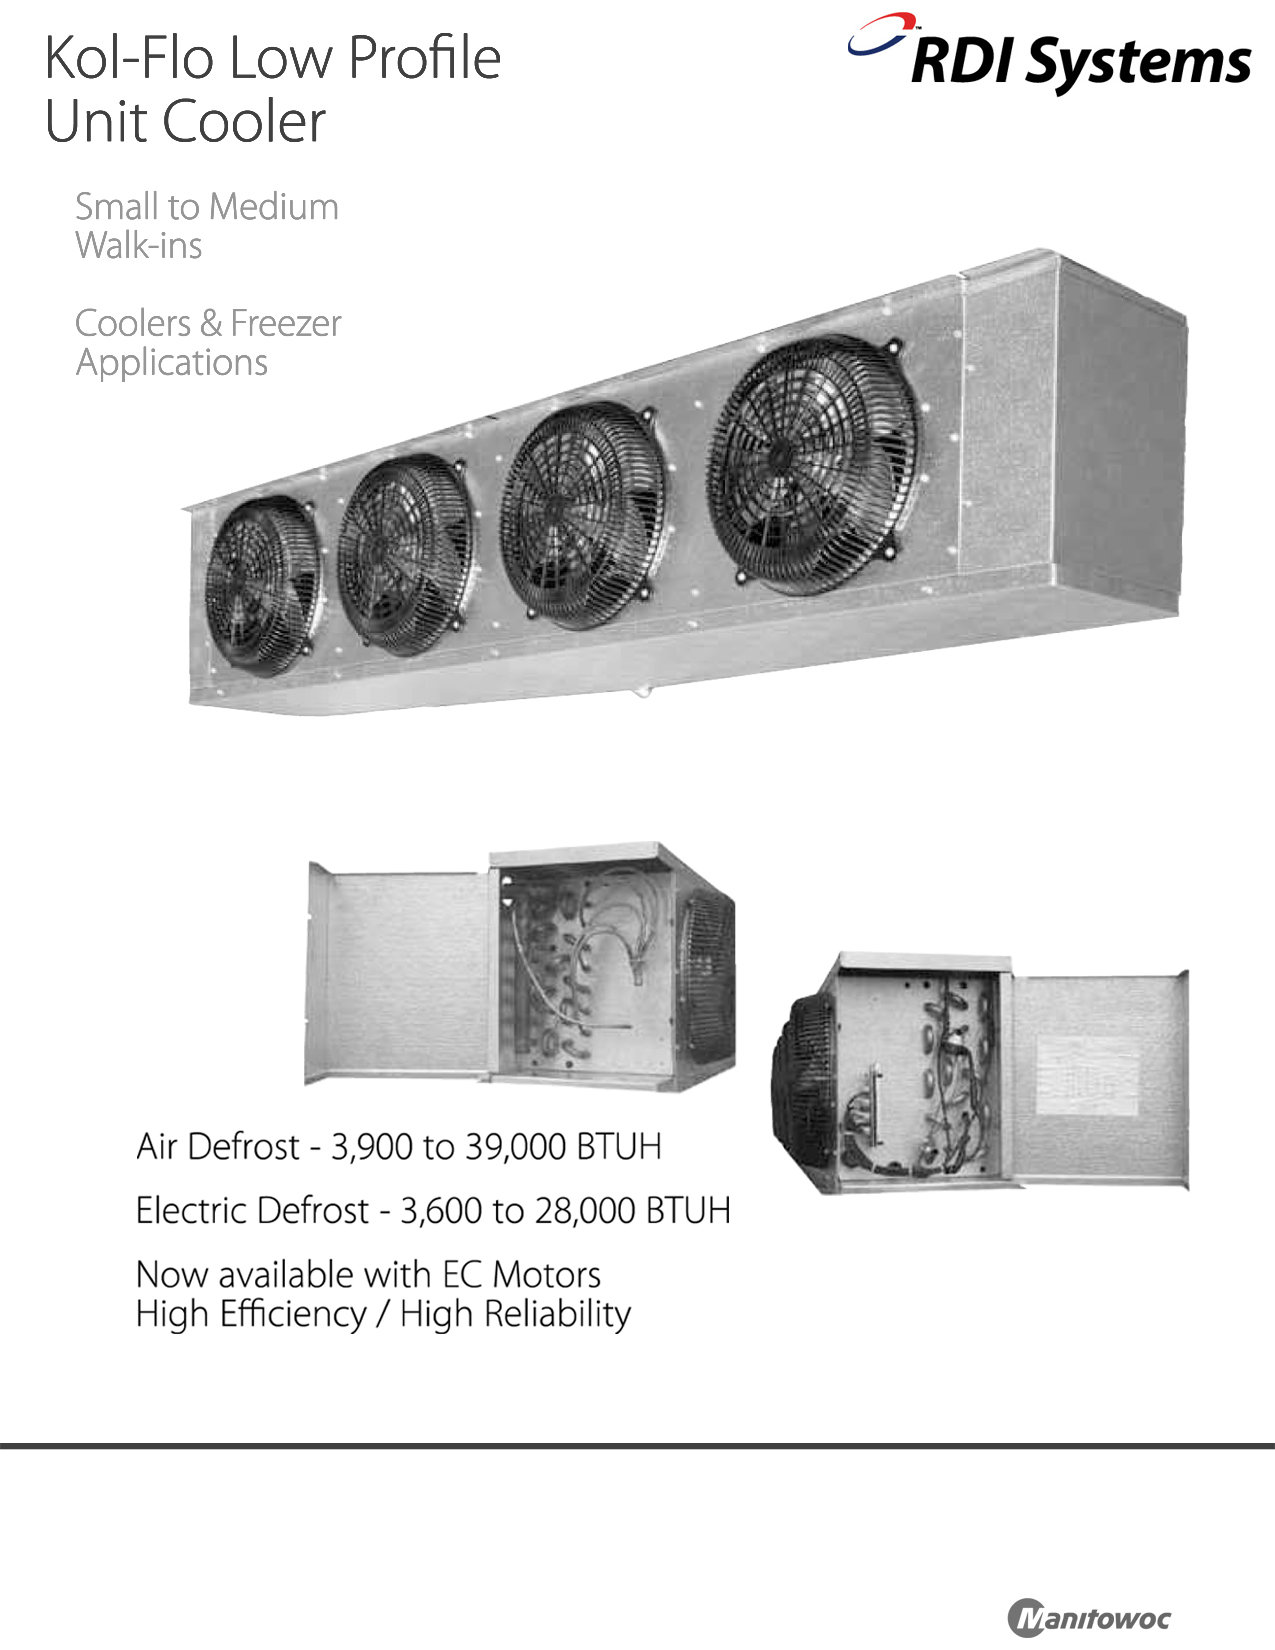 rdi refrigeration systems kol flo low profile cooler unit air cooled rh budgetheating com